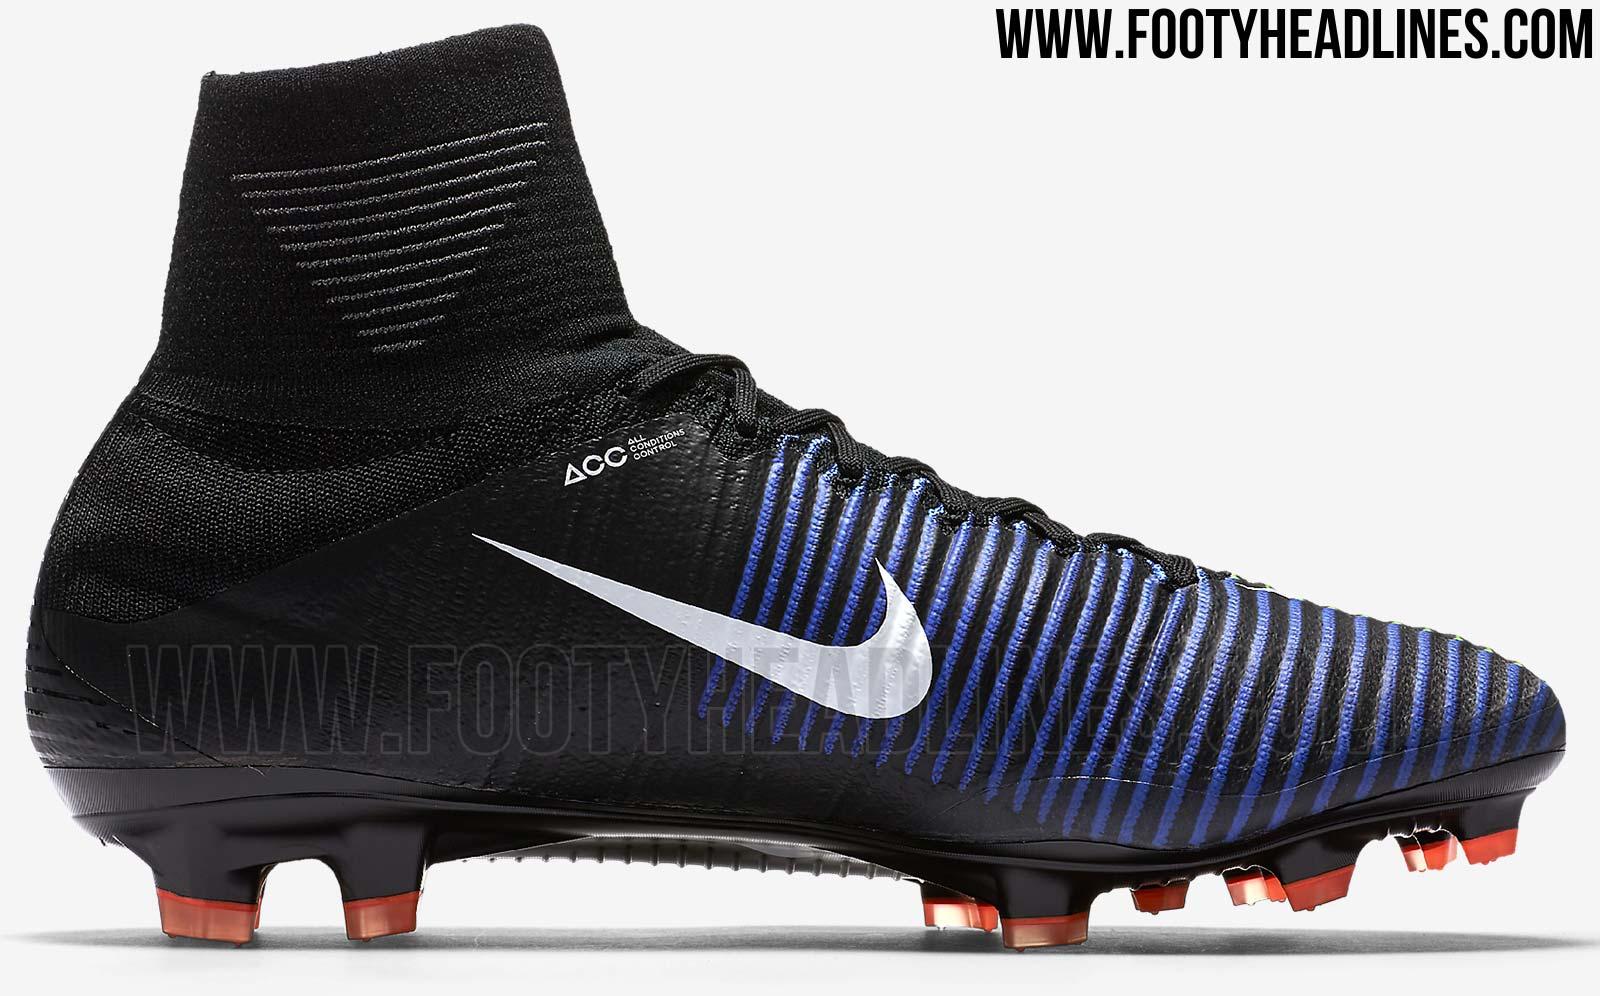 Australia Nike Mercurial Superfly V Fg Footballe Royal Bla